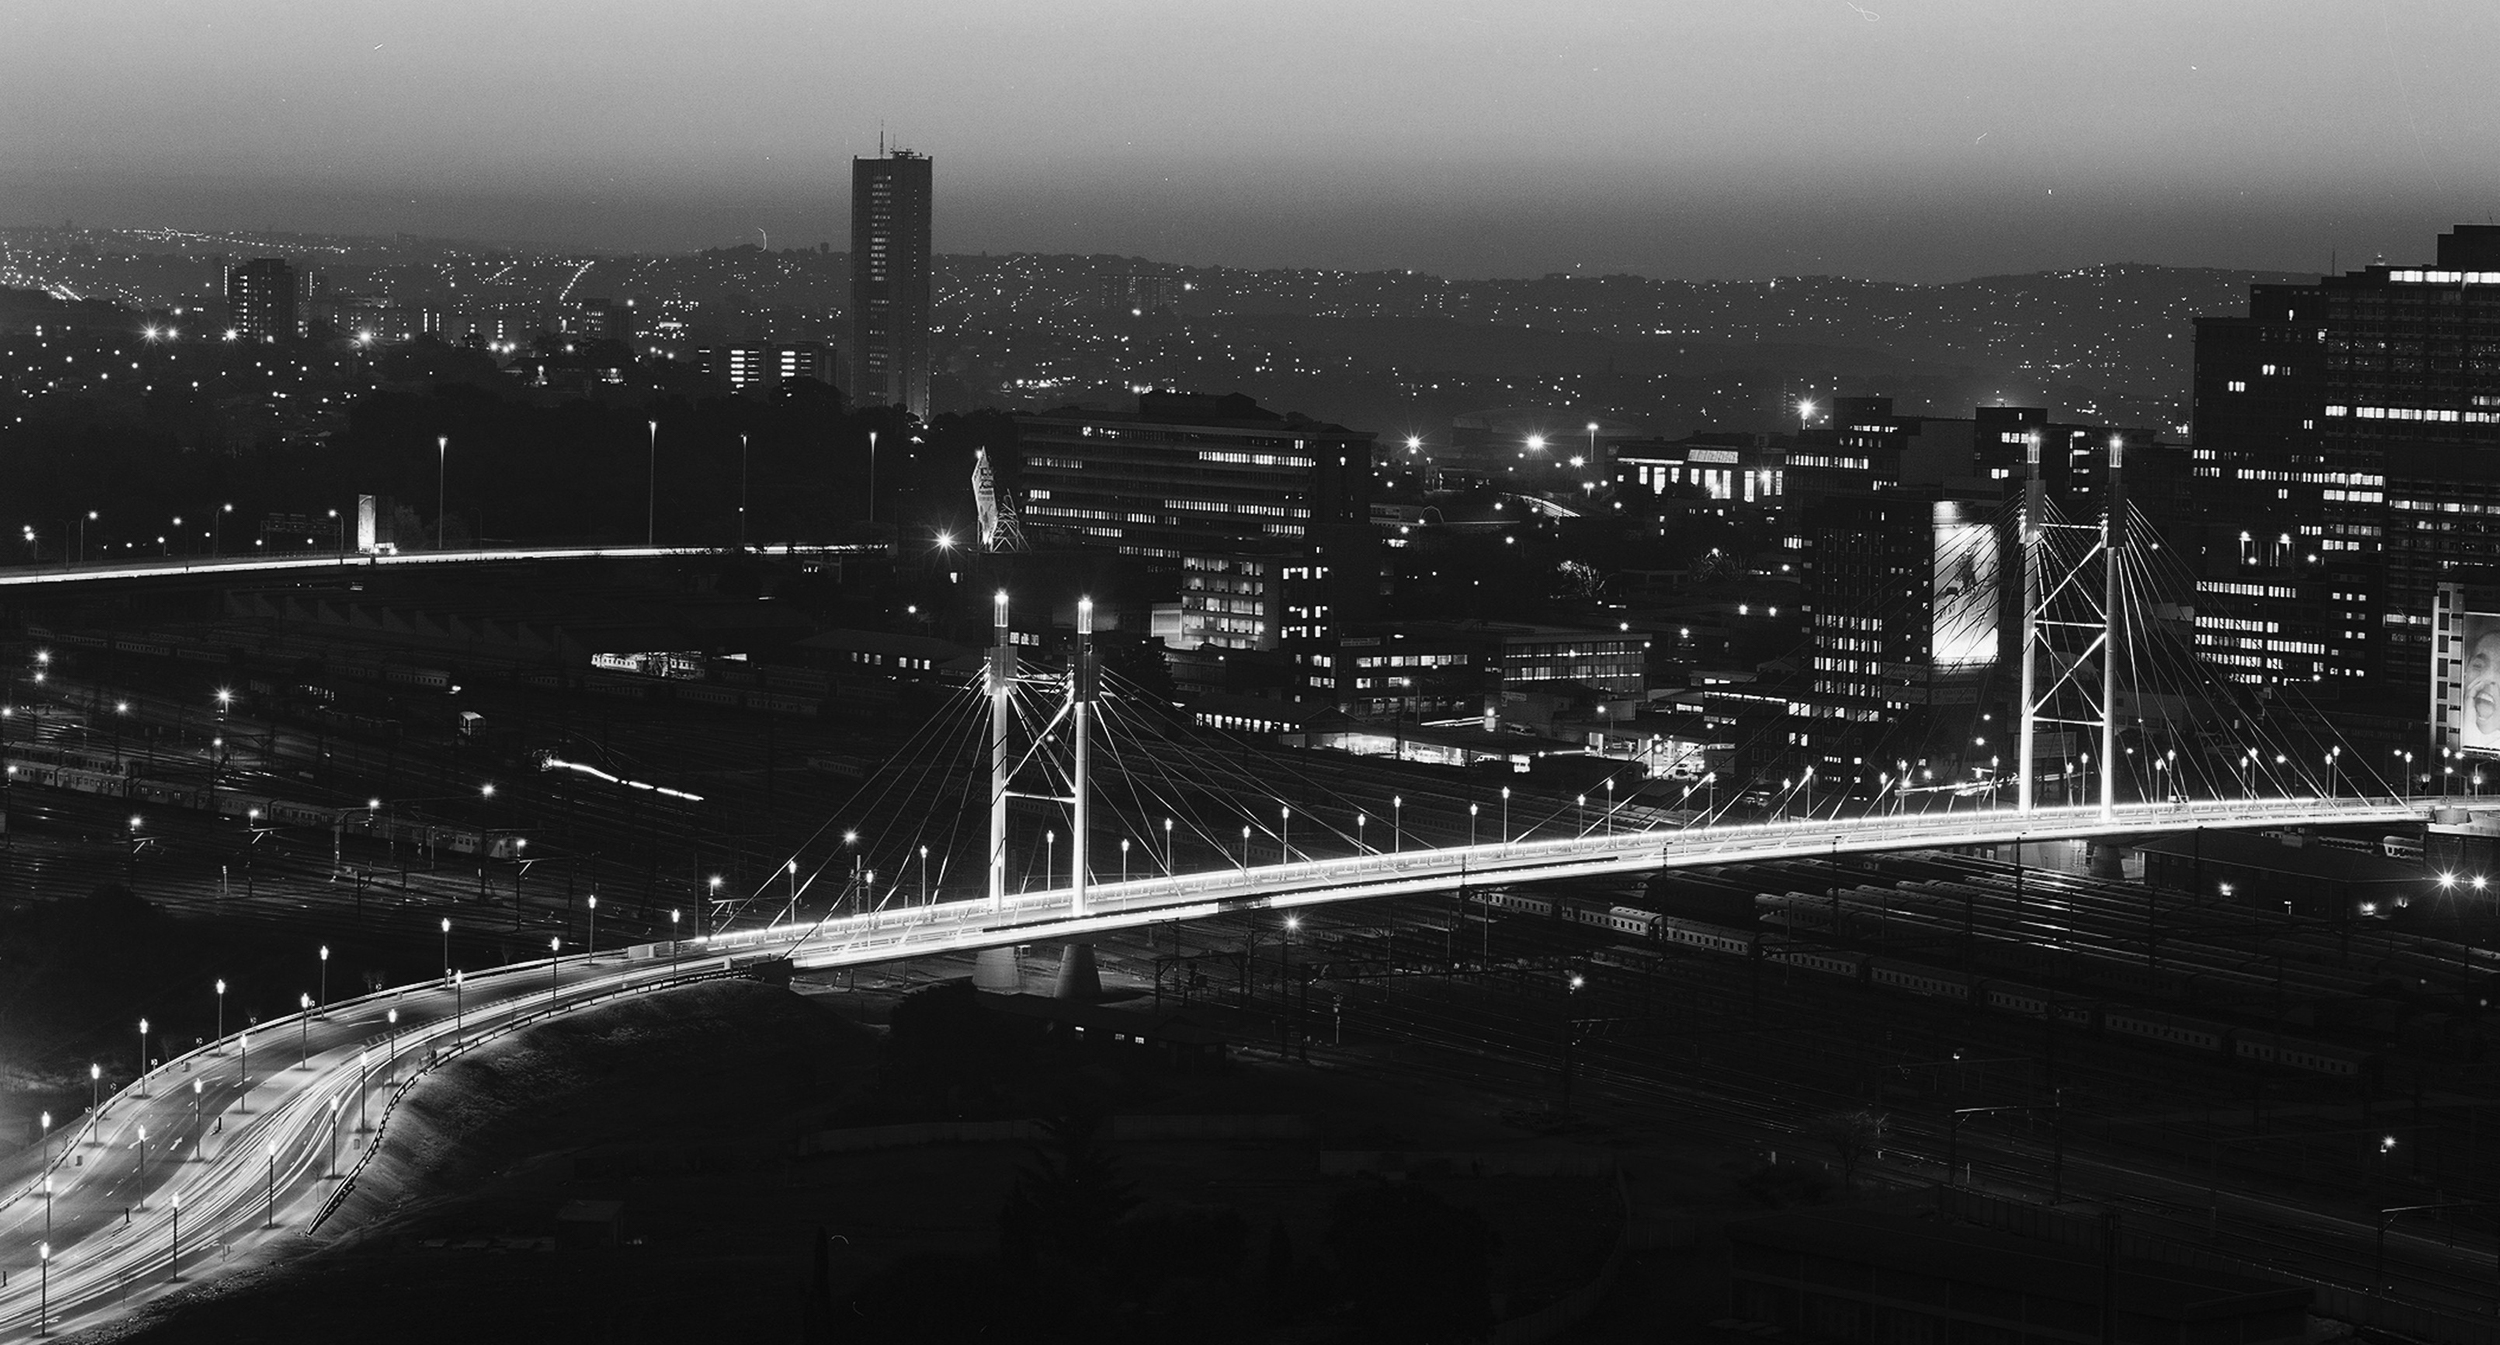 Award of the Century, South African Institute of Civil Engineering 2003    Nelson Mandela Bridge  in South Africa was presented with the Award of the Century in the construction construction by the South African Institute of Civil Engineering.